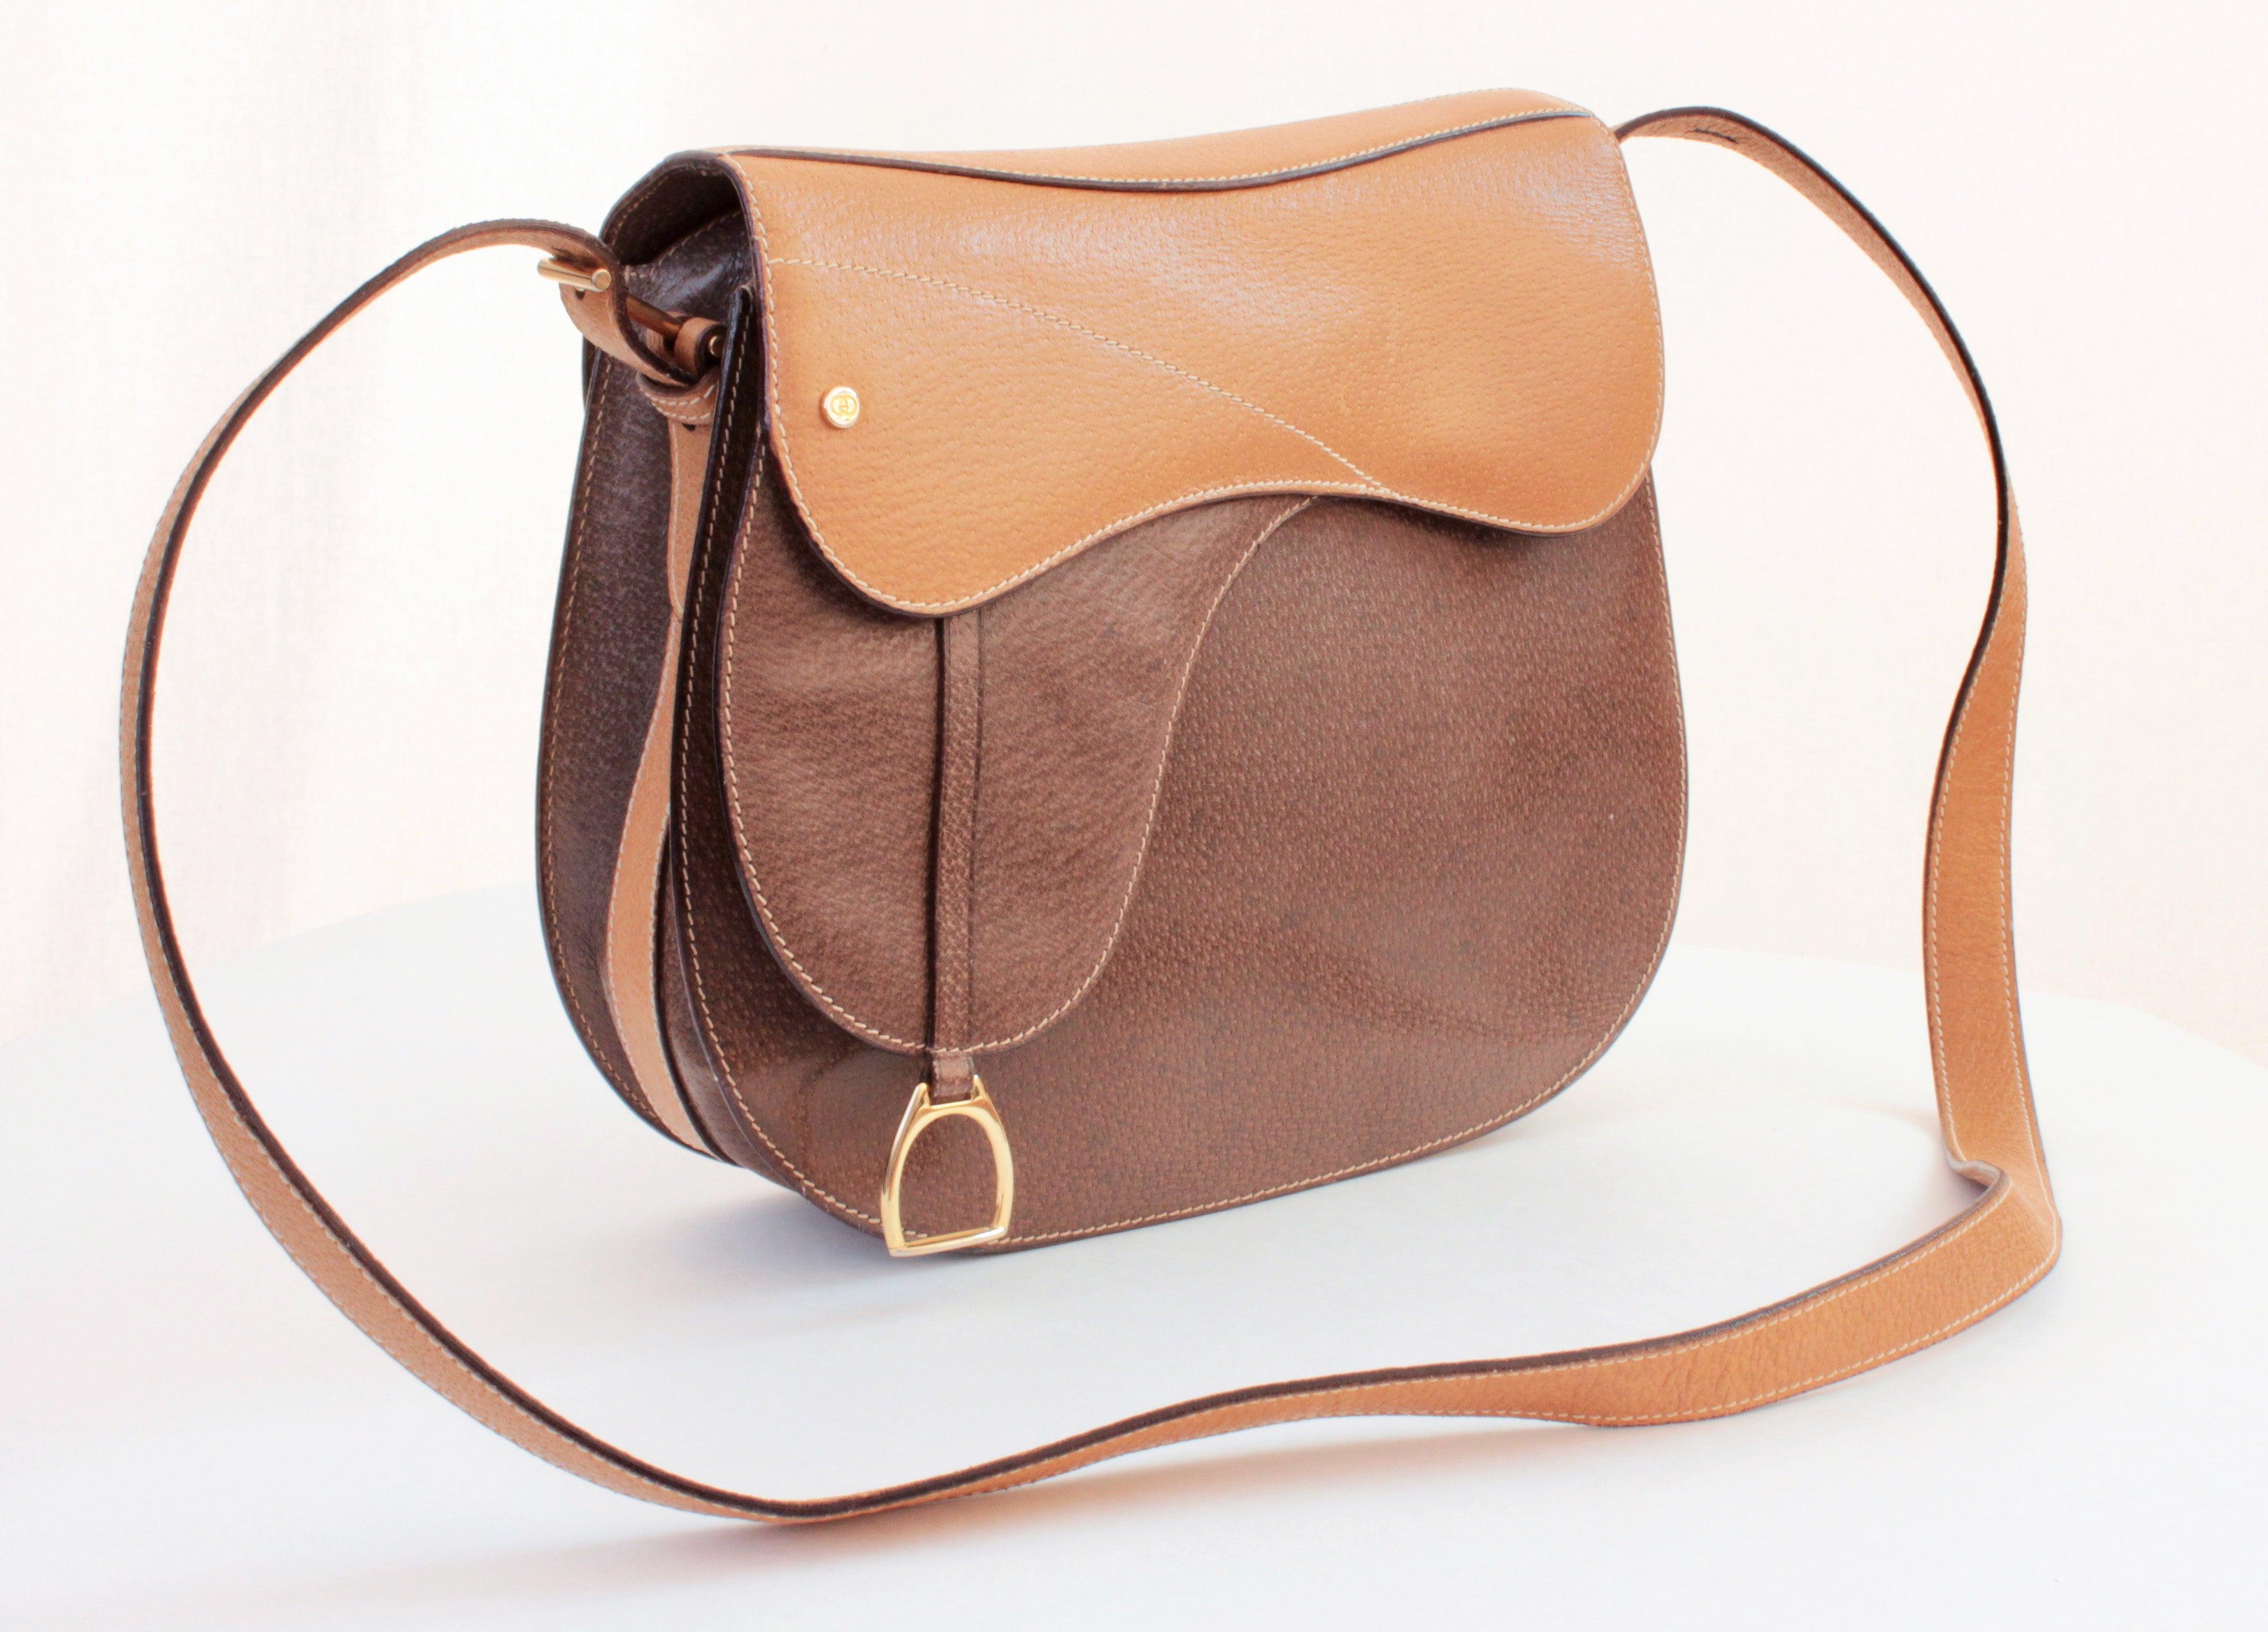 6ef23aaaaae Gucci Equestrian Pigskin Leather Stirrup Charm Vintage Saddle Bag ...